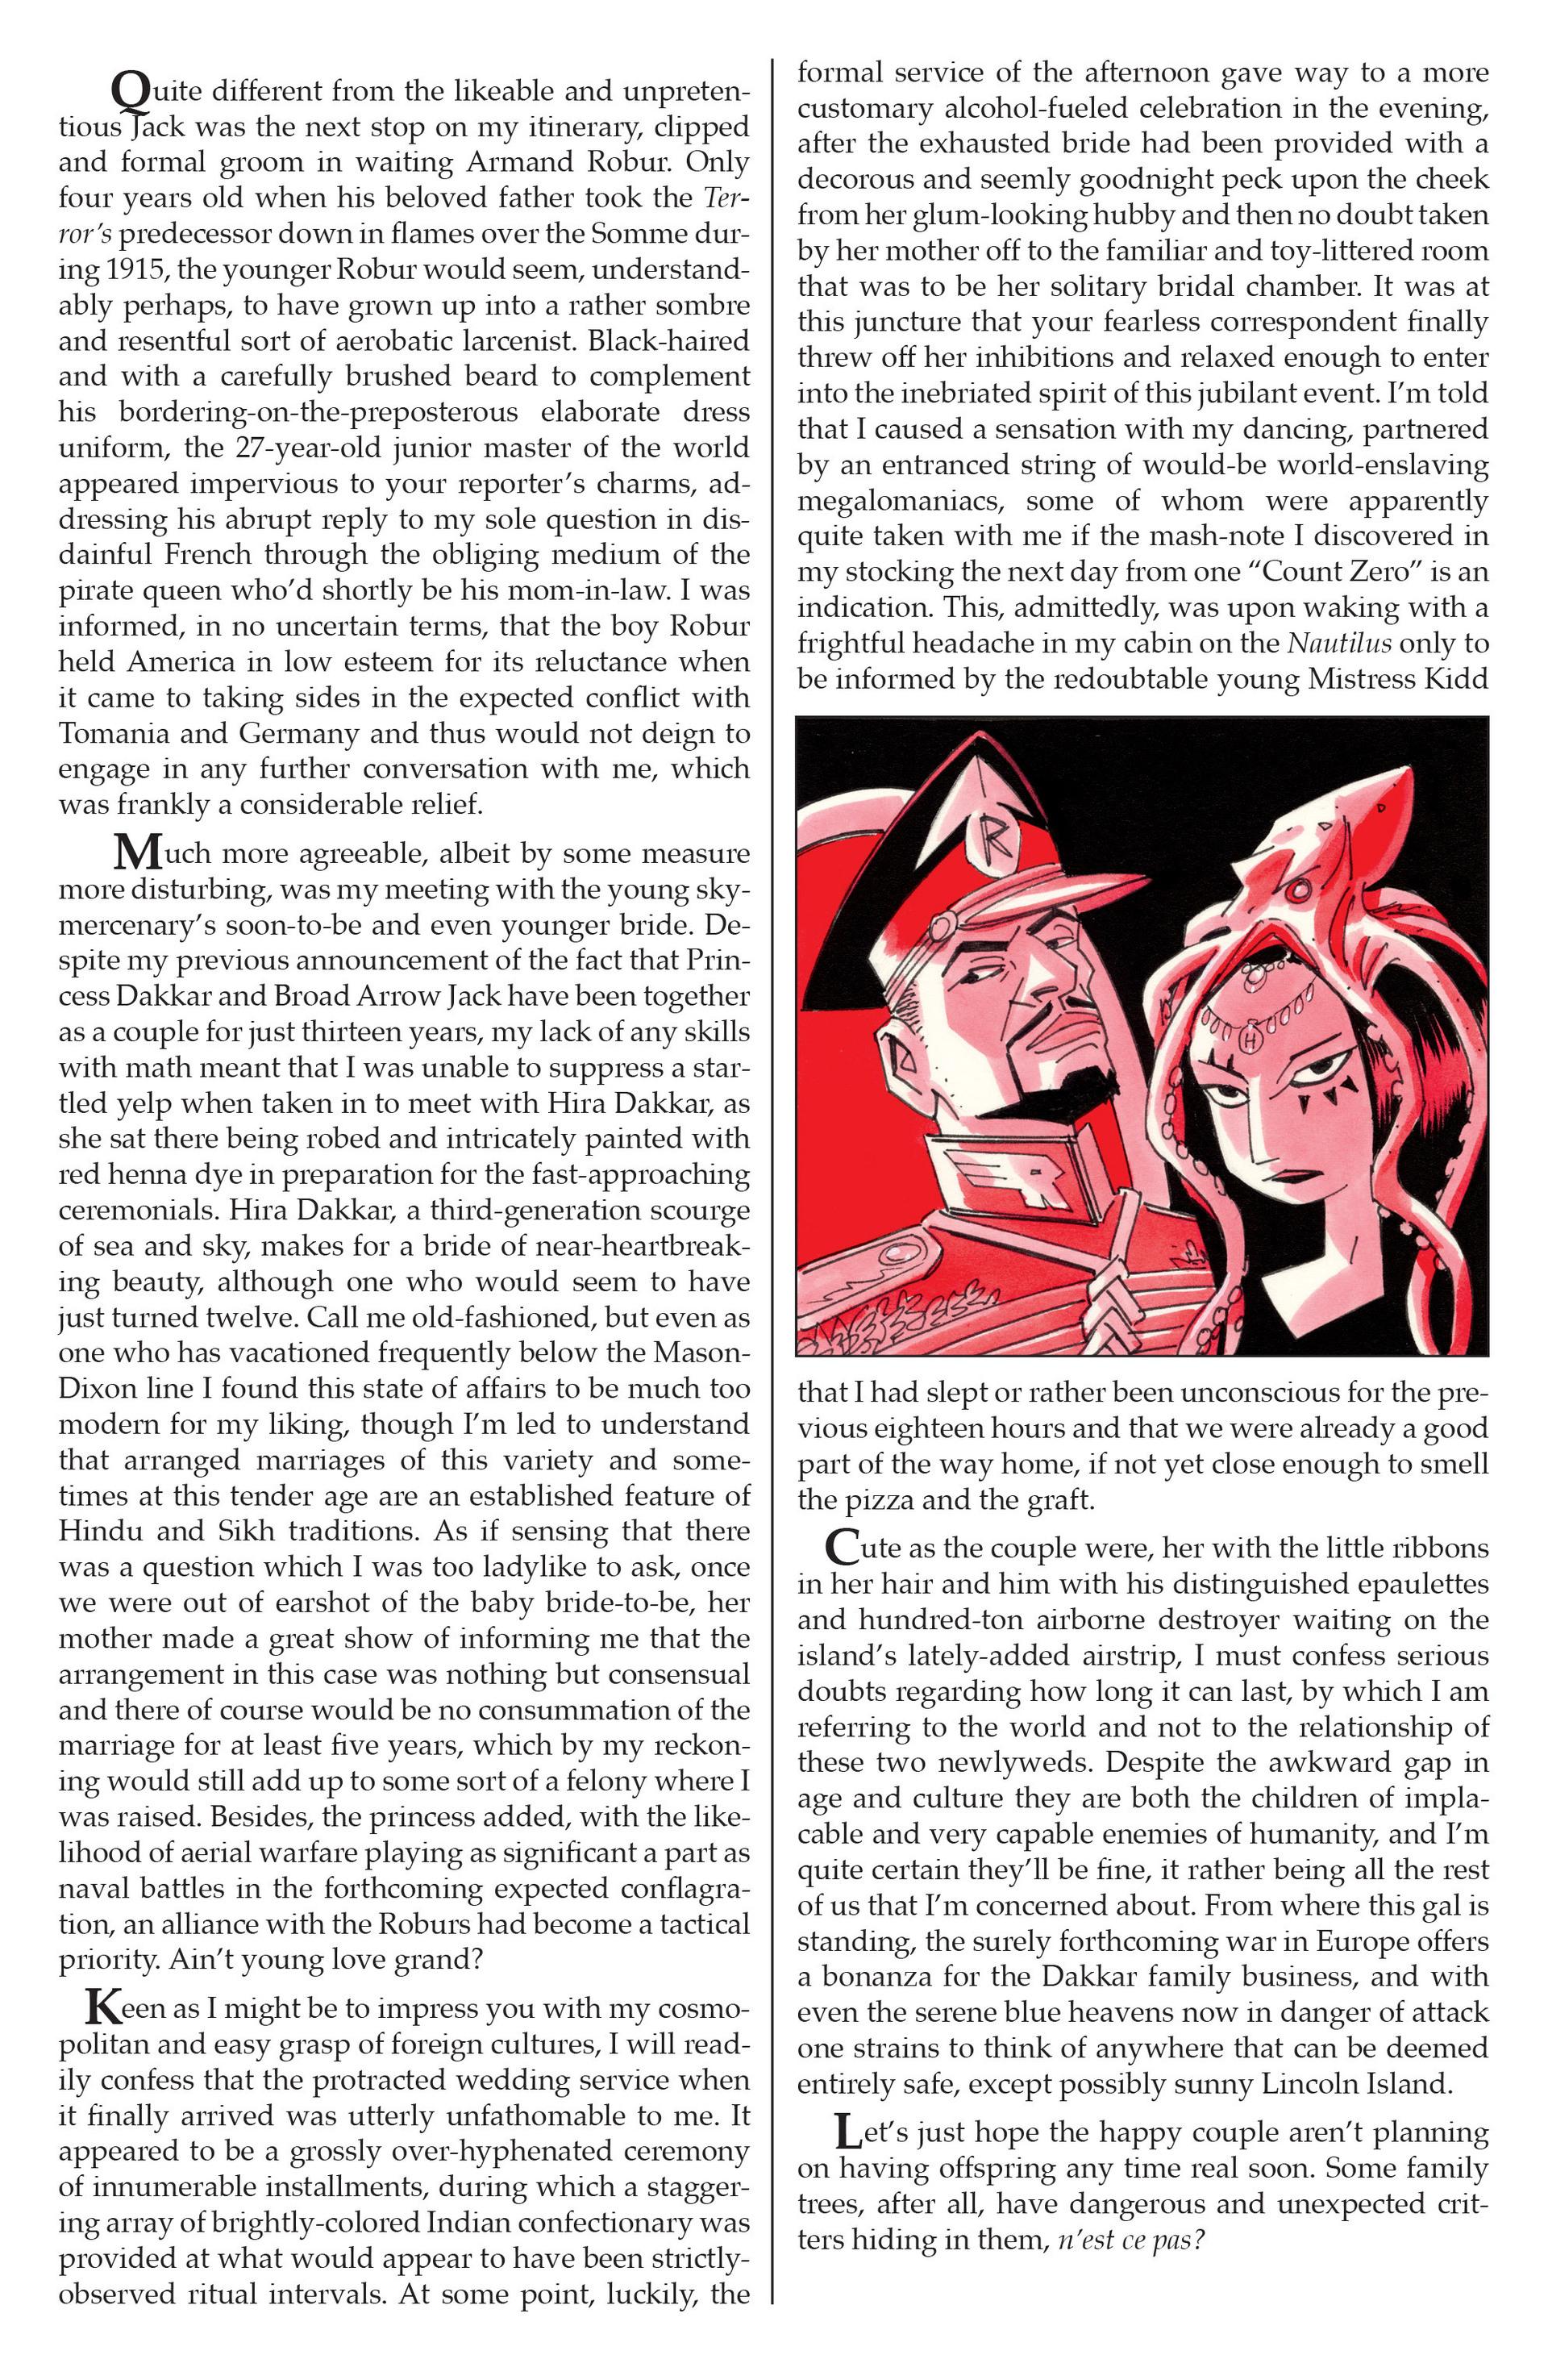 Read online Nemo: Heart of Ice comic -  Issue # Full - 53